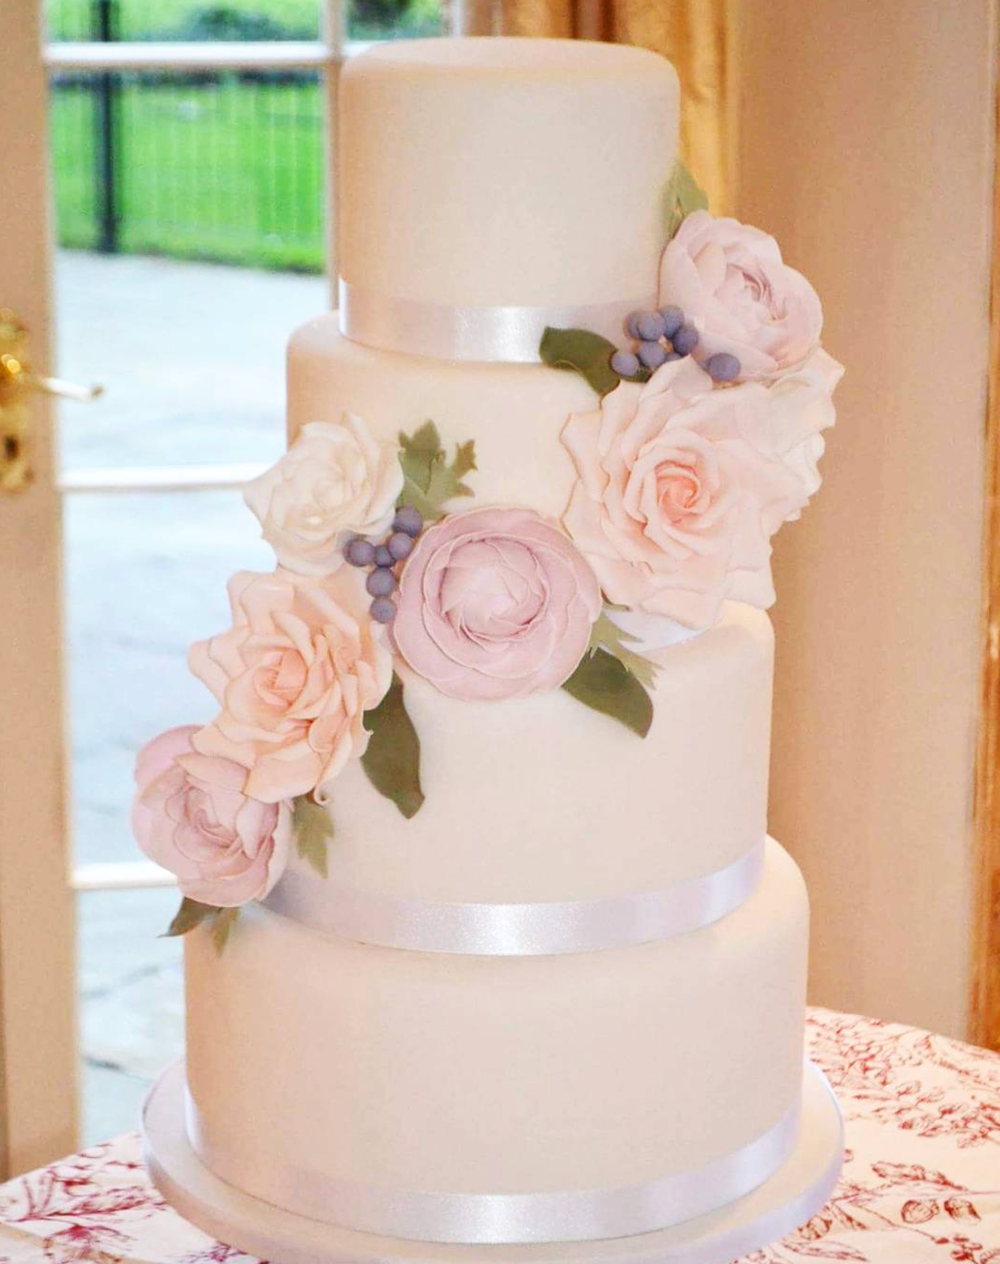 DOTTY ROSE CAKE DESIGN 4 TIER FONDANT WEDDING CAKE.png